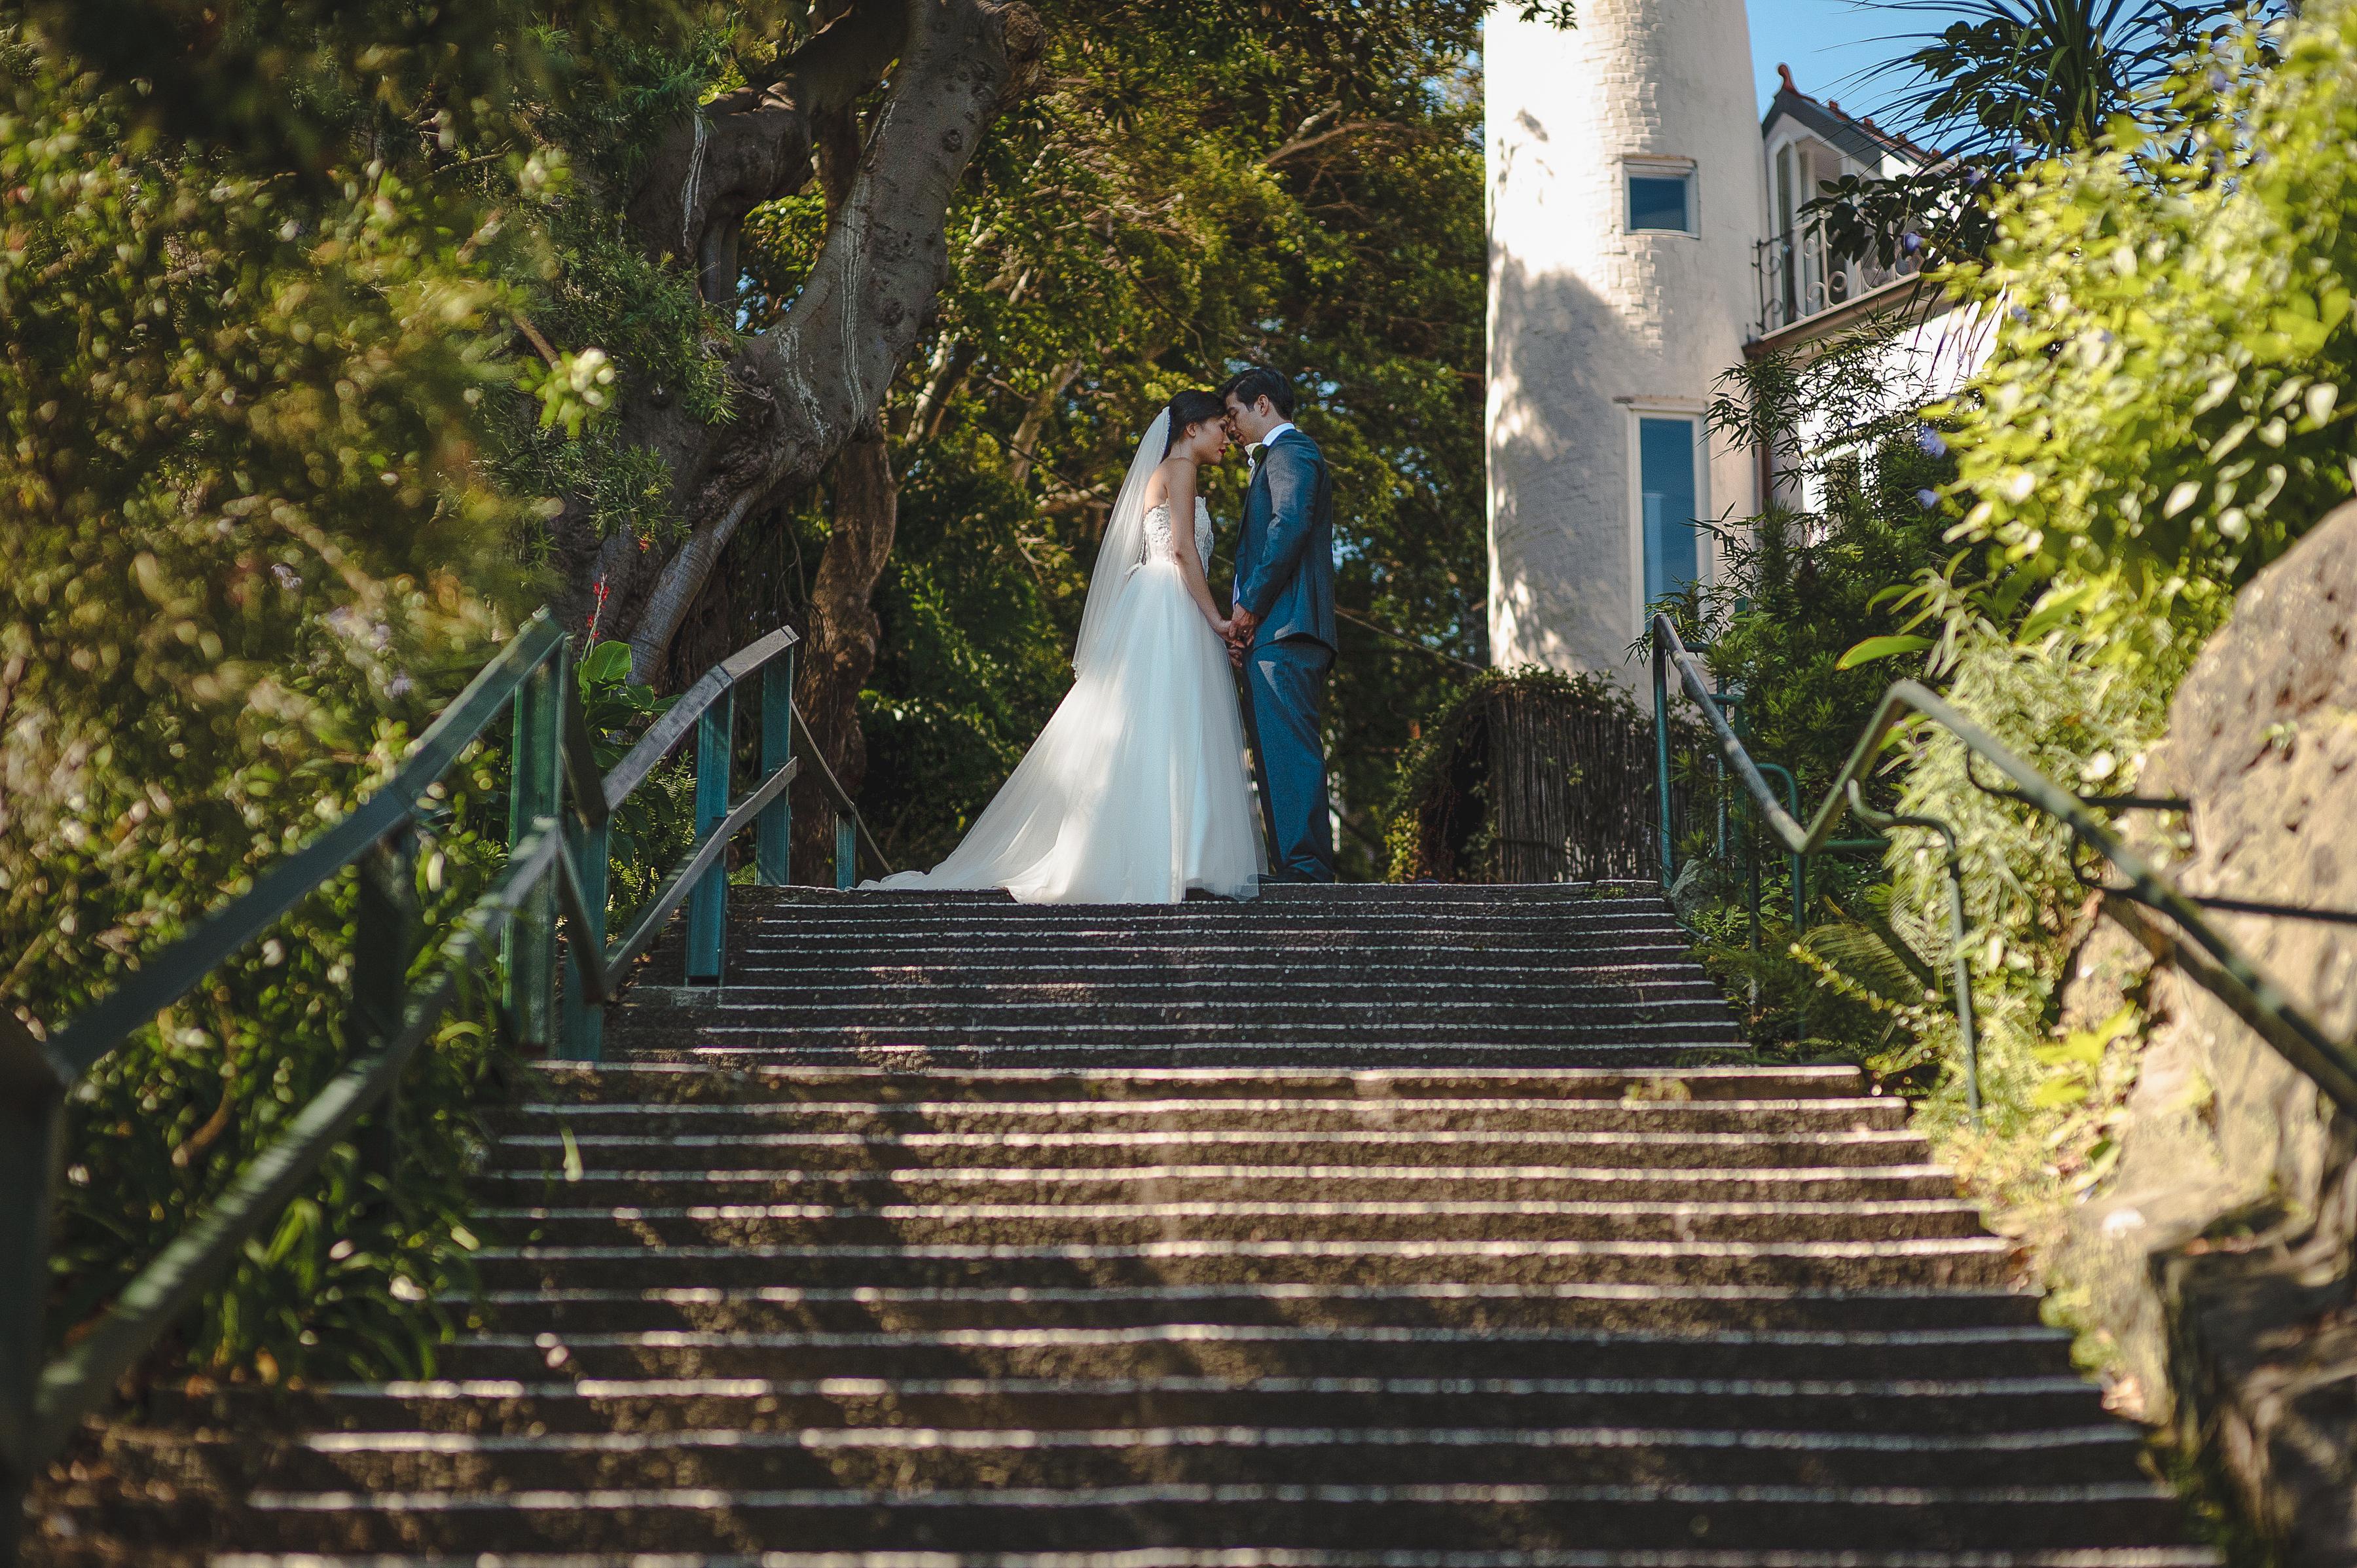 https://sleeklens.com/wp-content/uploads/2018/09/wedding-lightroom-presets-signature-bride-groom-after-2.jpg